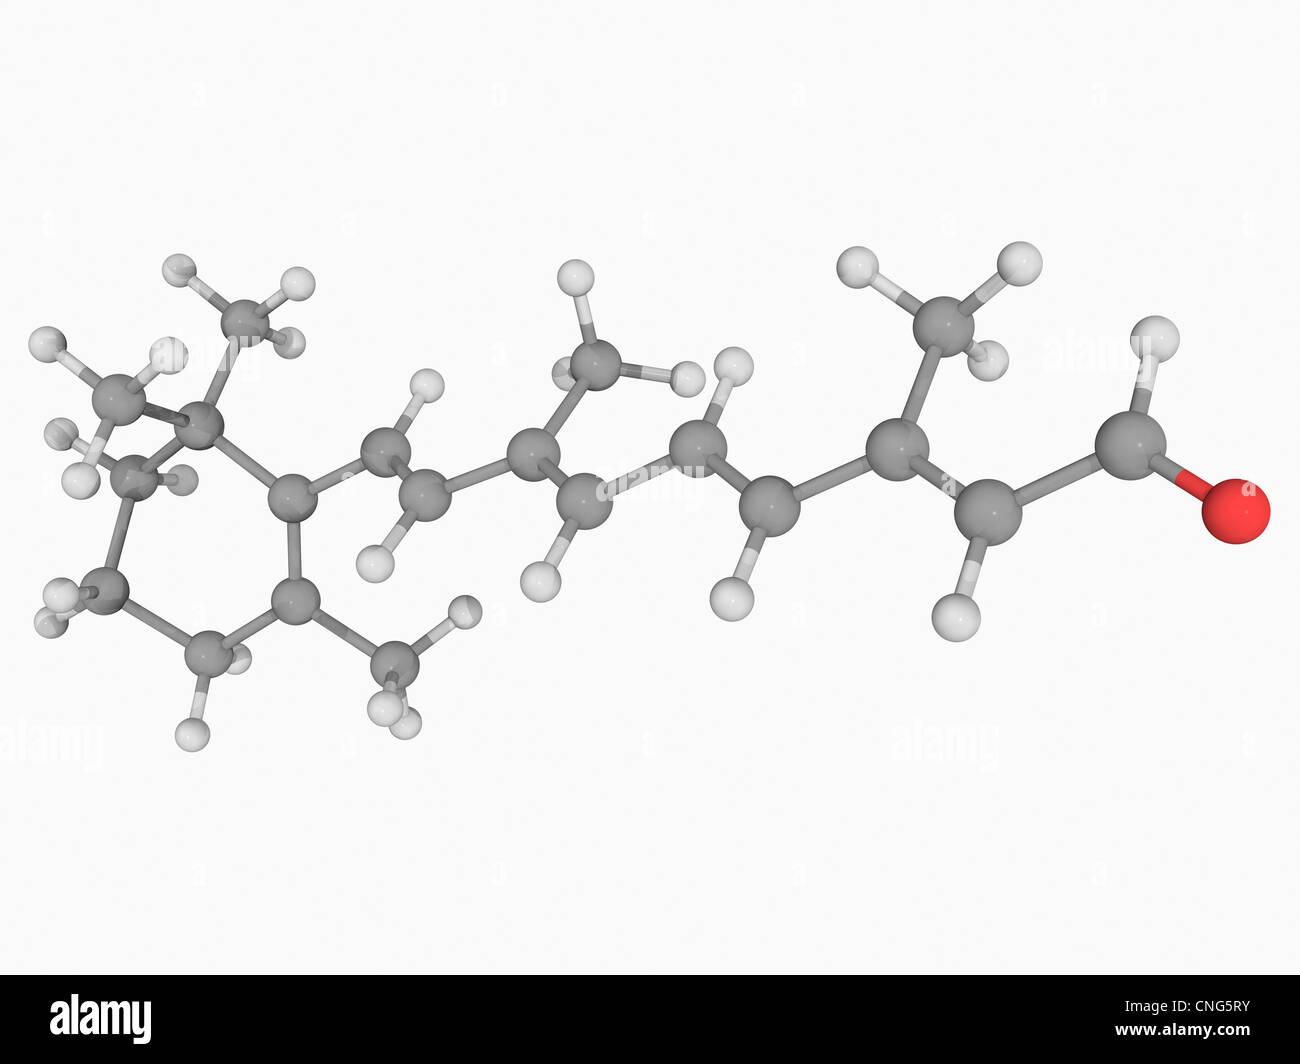 Retinal (vitamin A) molecule - Stock Image